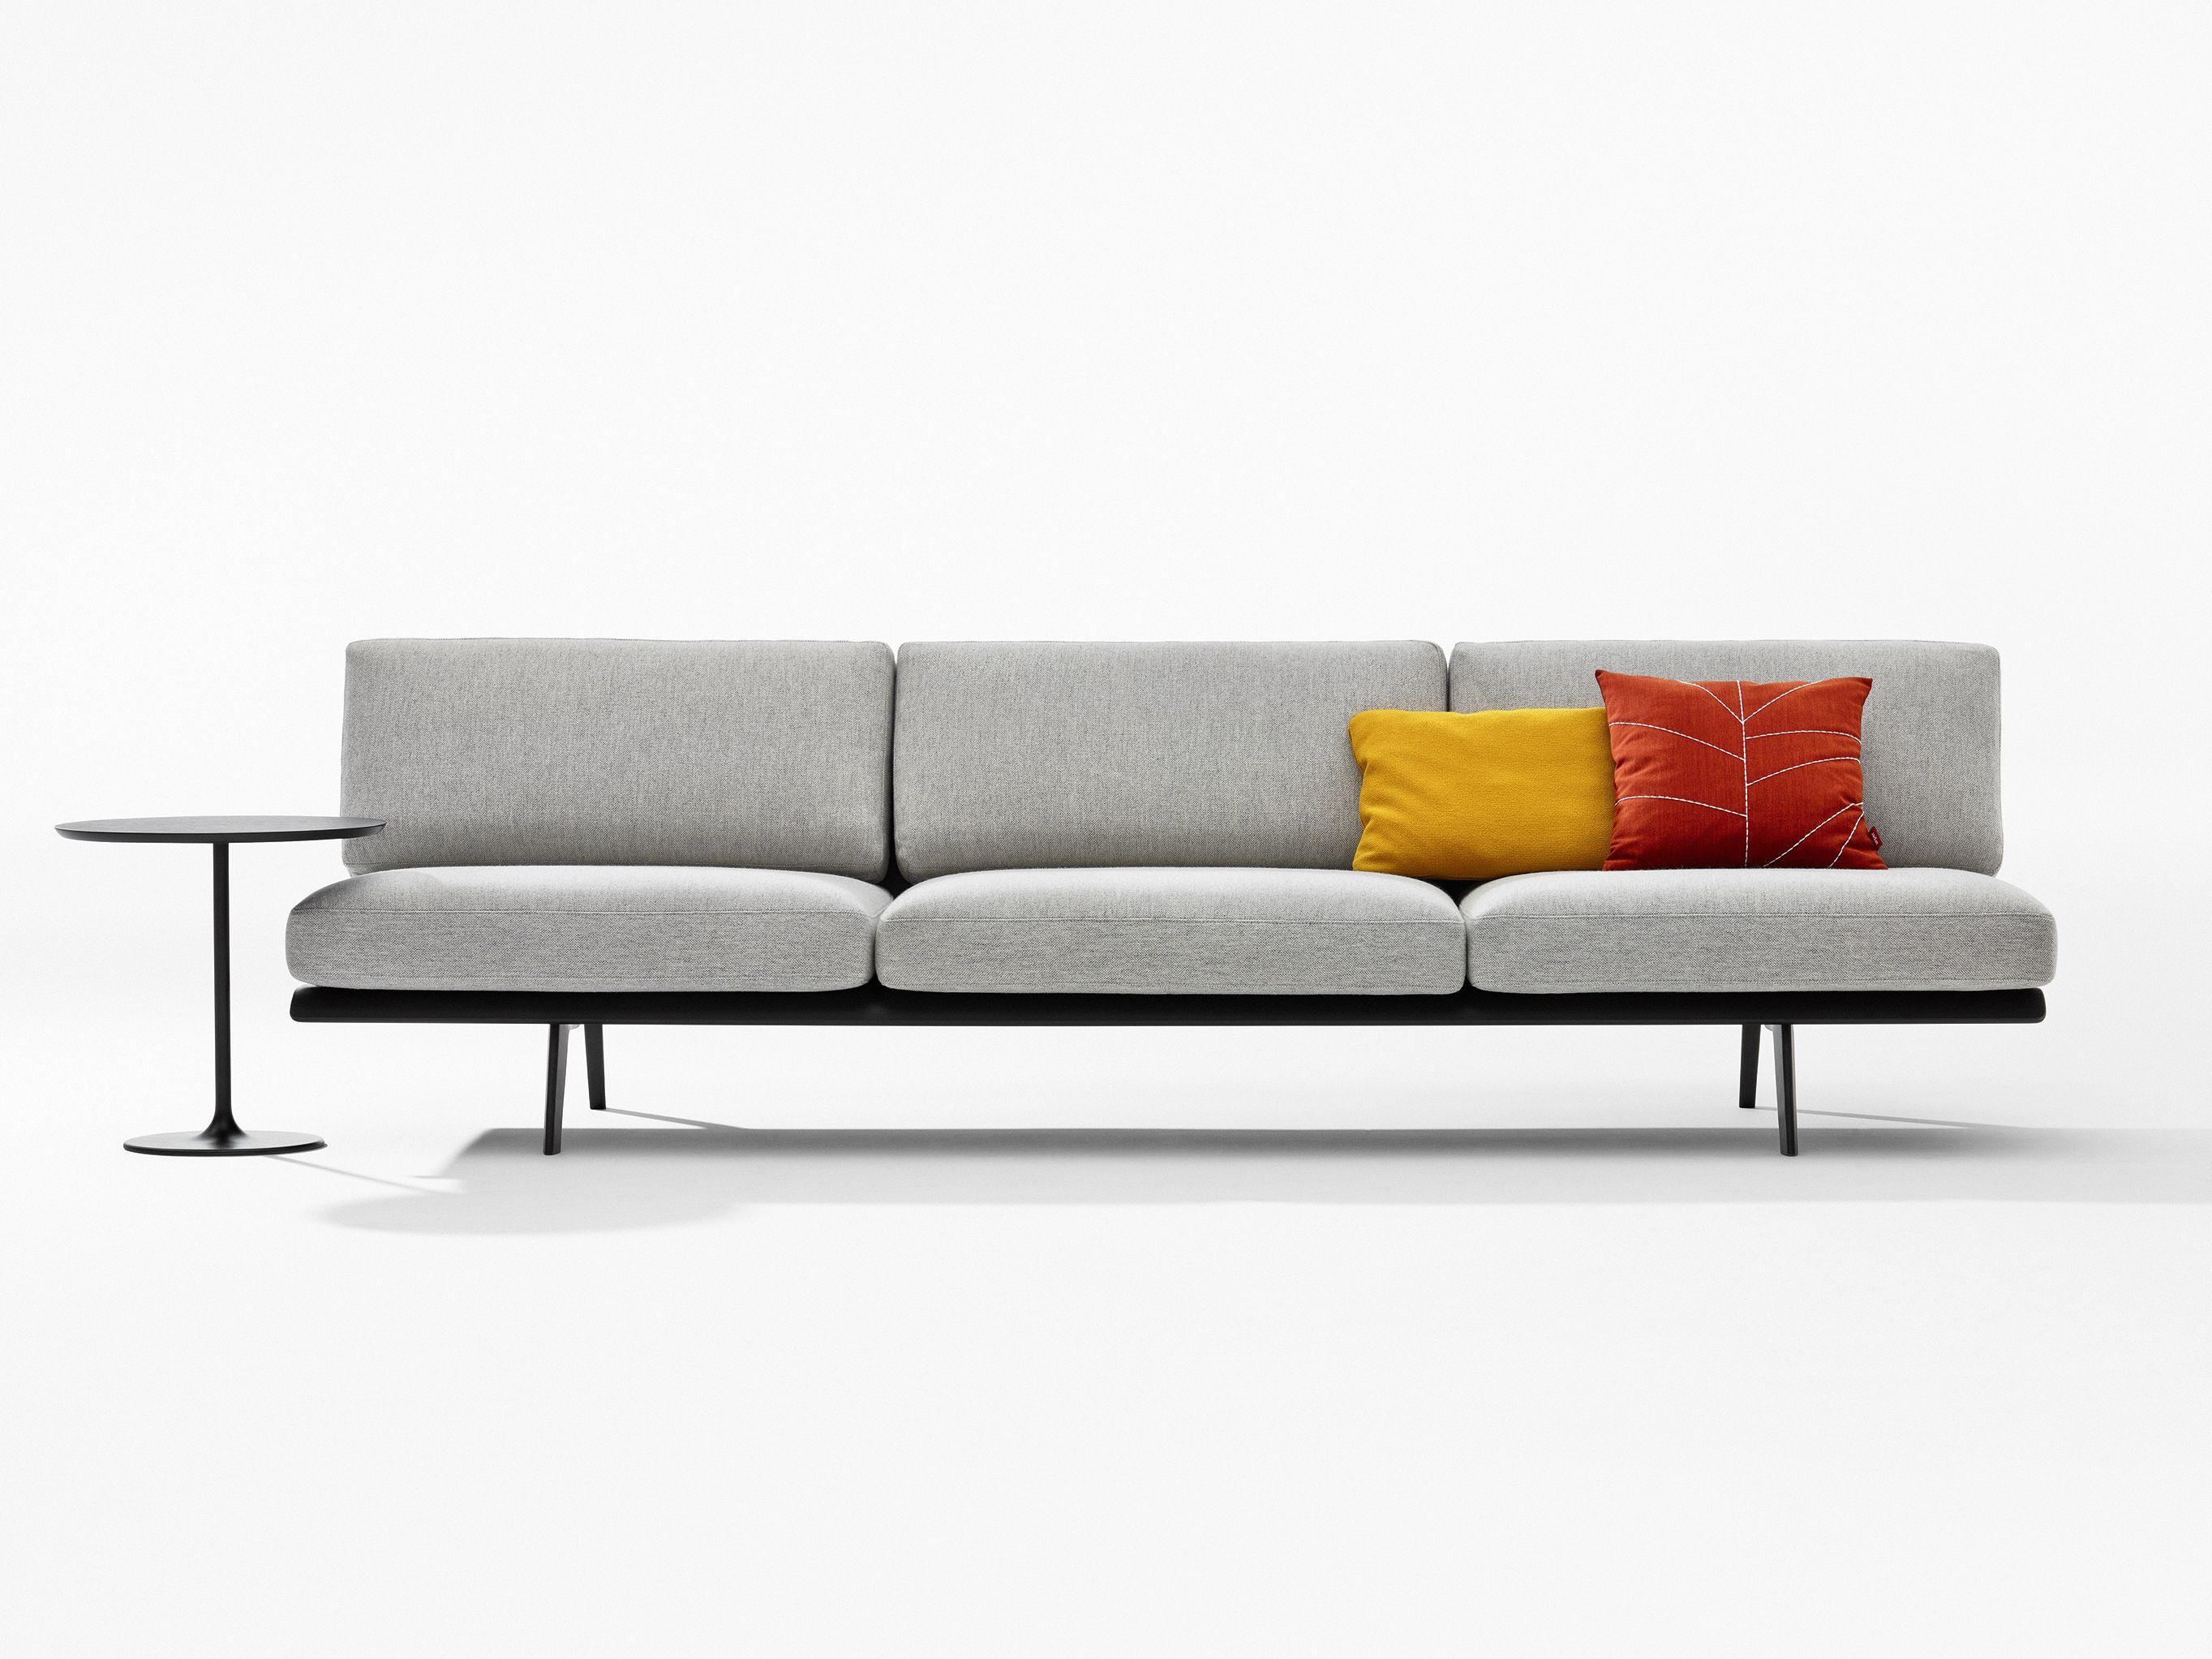 modulares sofa zinta lounge by arper design lievore altherr molina. Black Bedroom Furniture Sets. Home Design Ideas